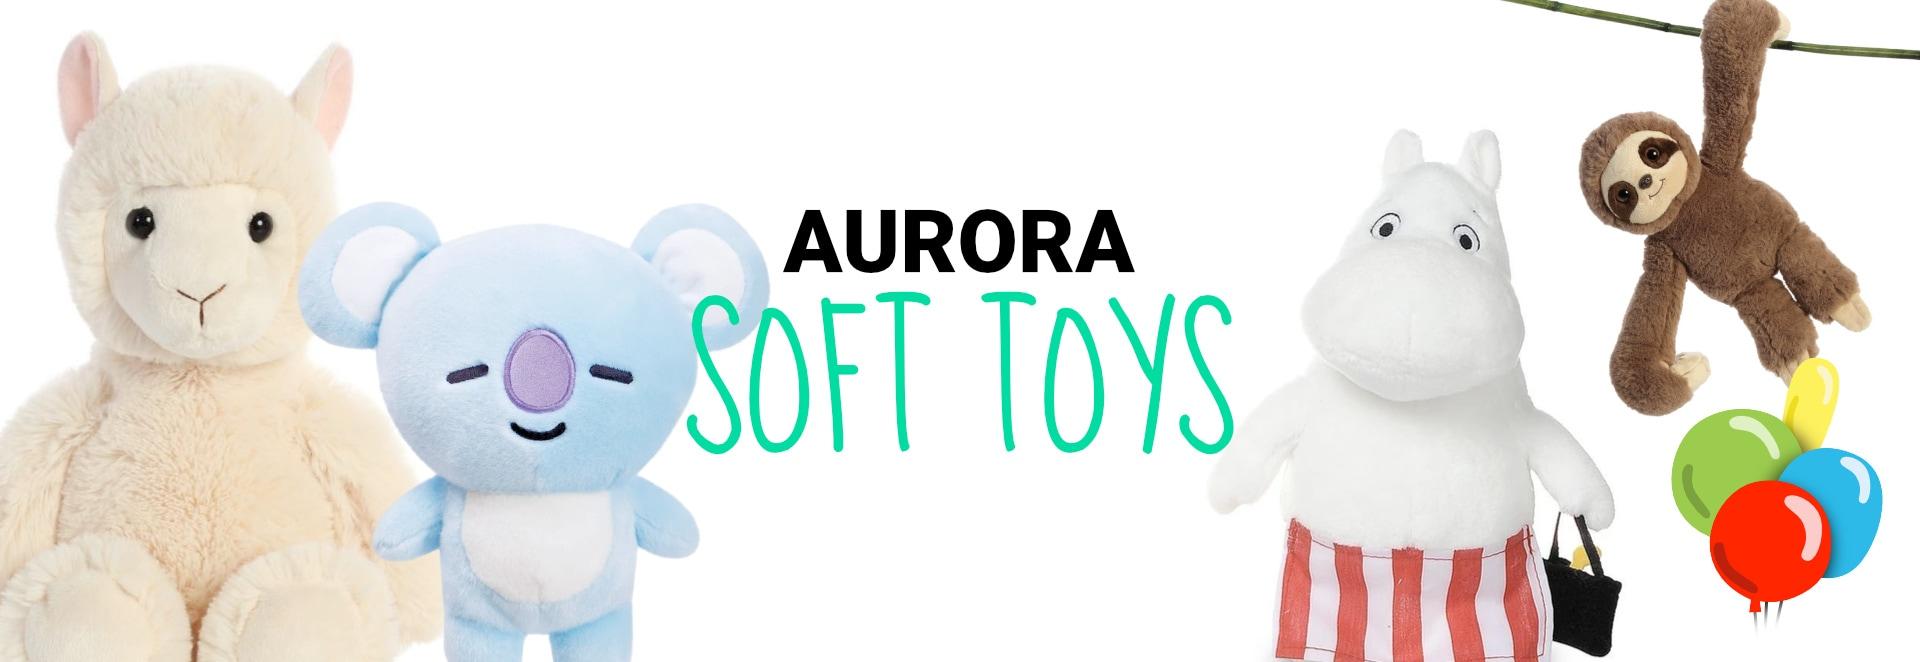 Aurora Soft Toys